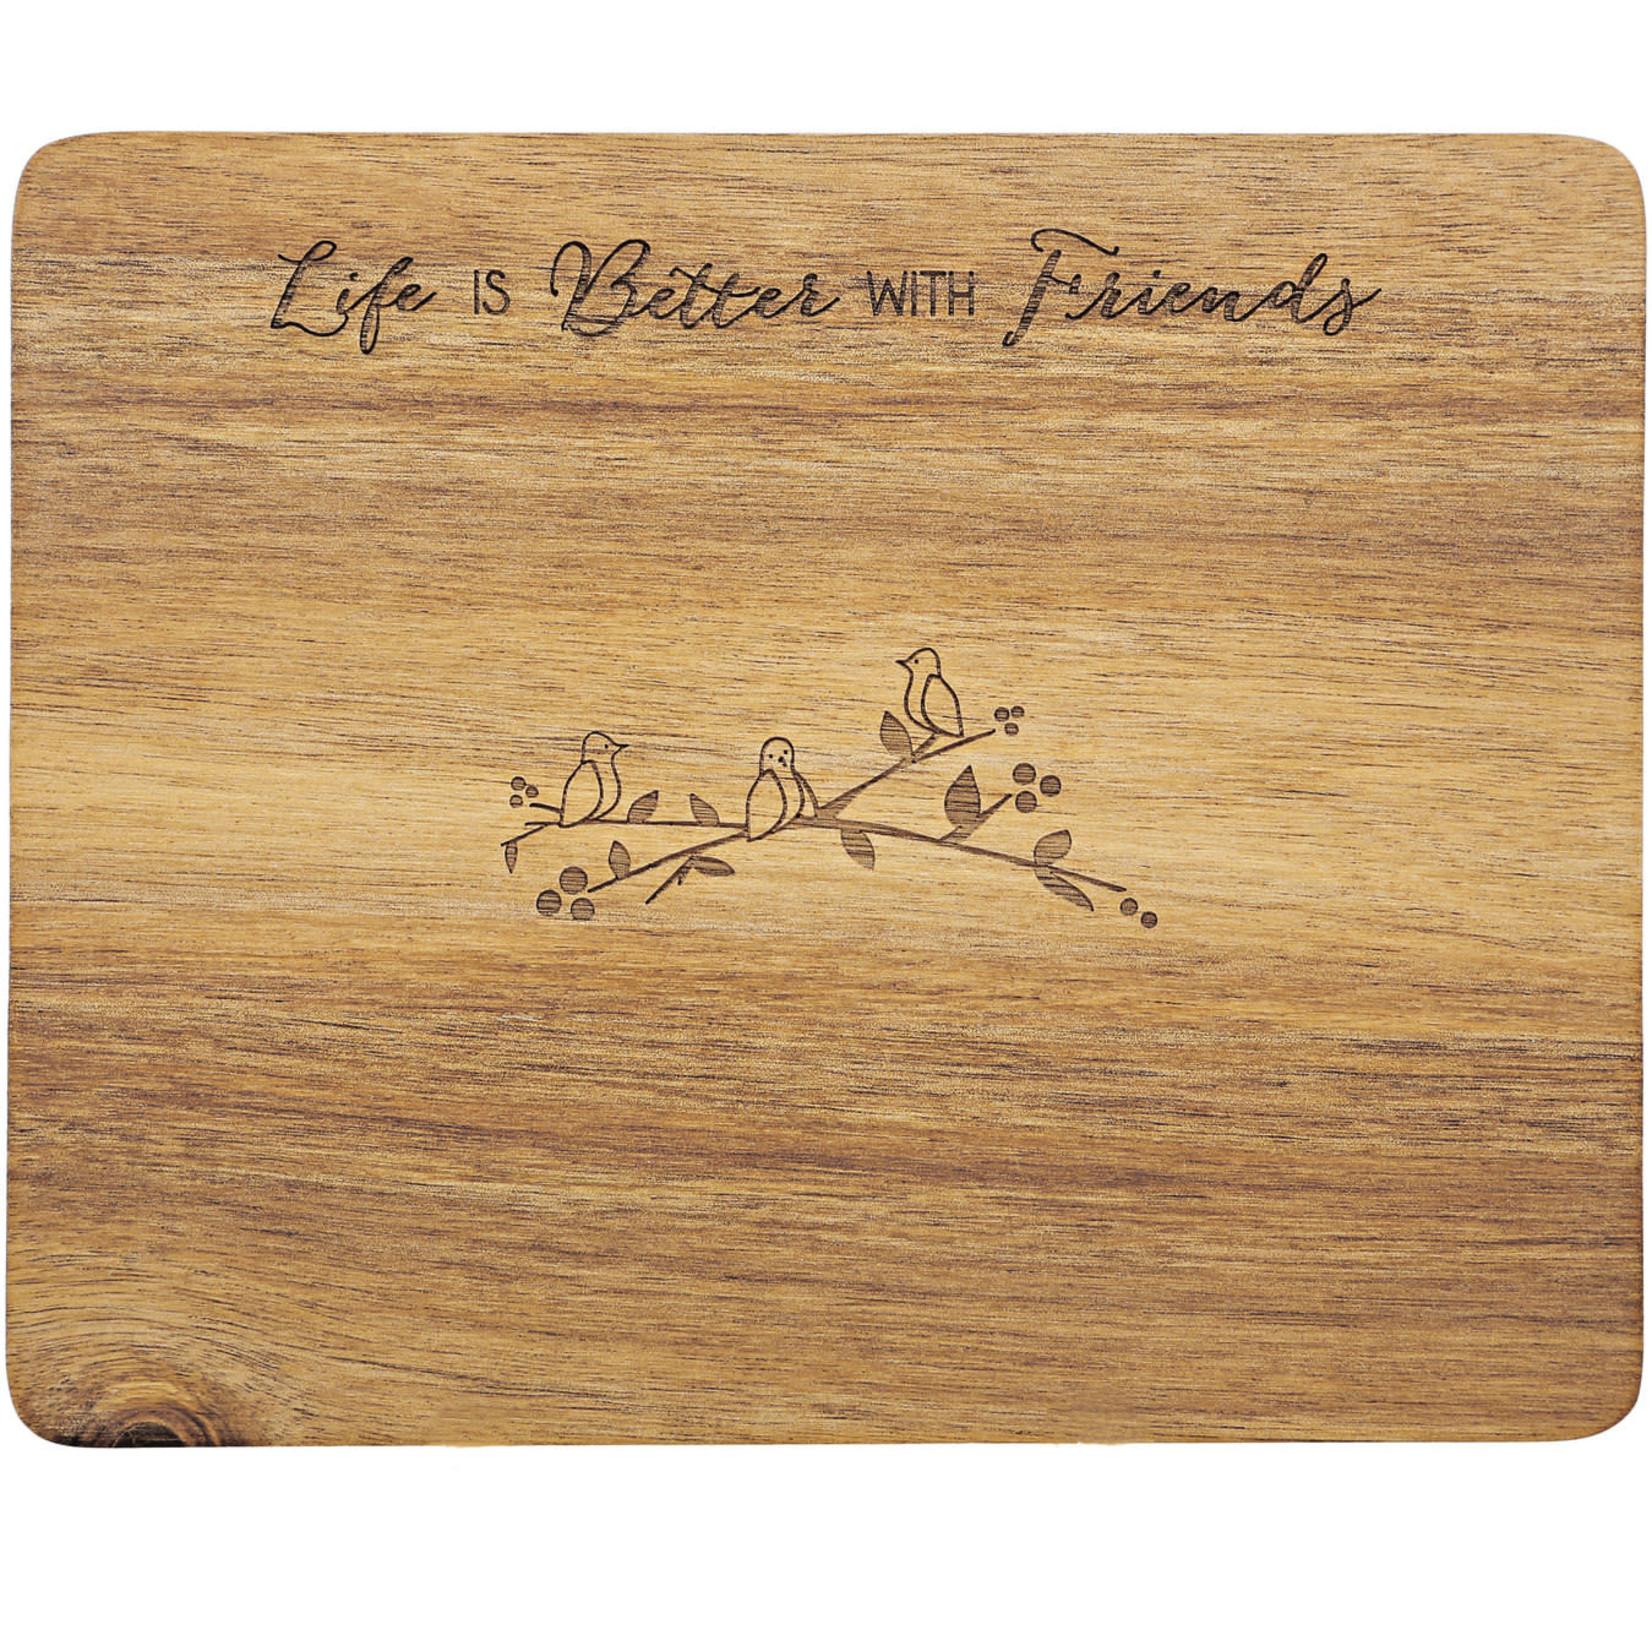 "Pavilion Gift Co. Kitchen: Friends- 9"" Cheese/Bread Board Set"